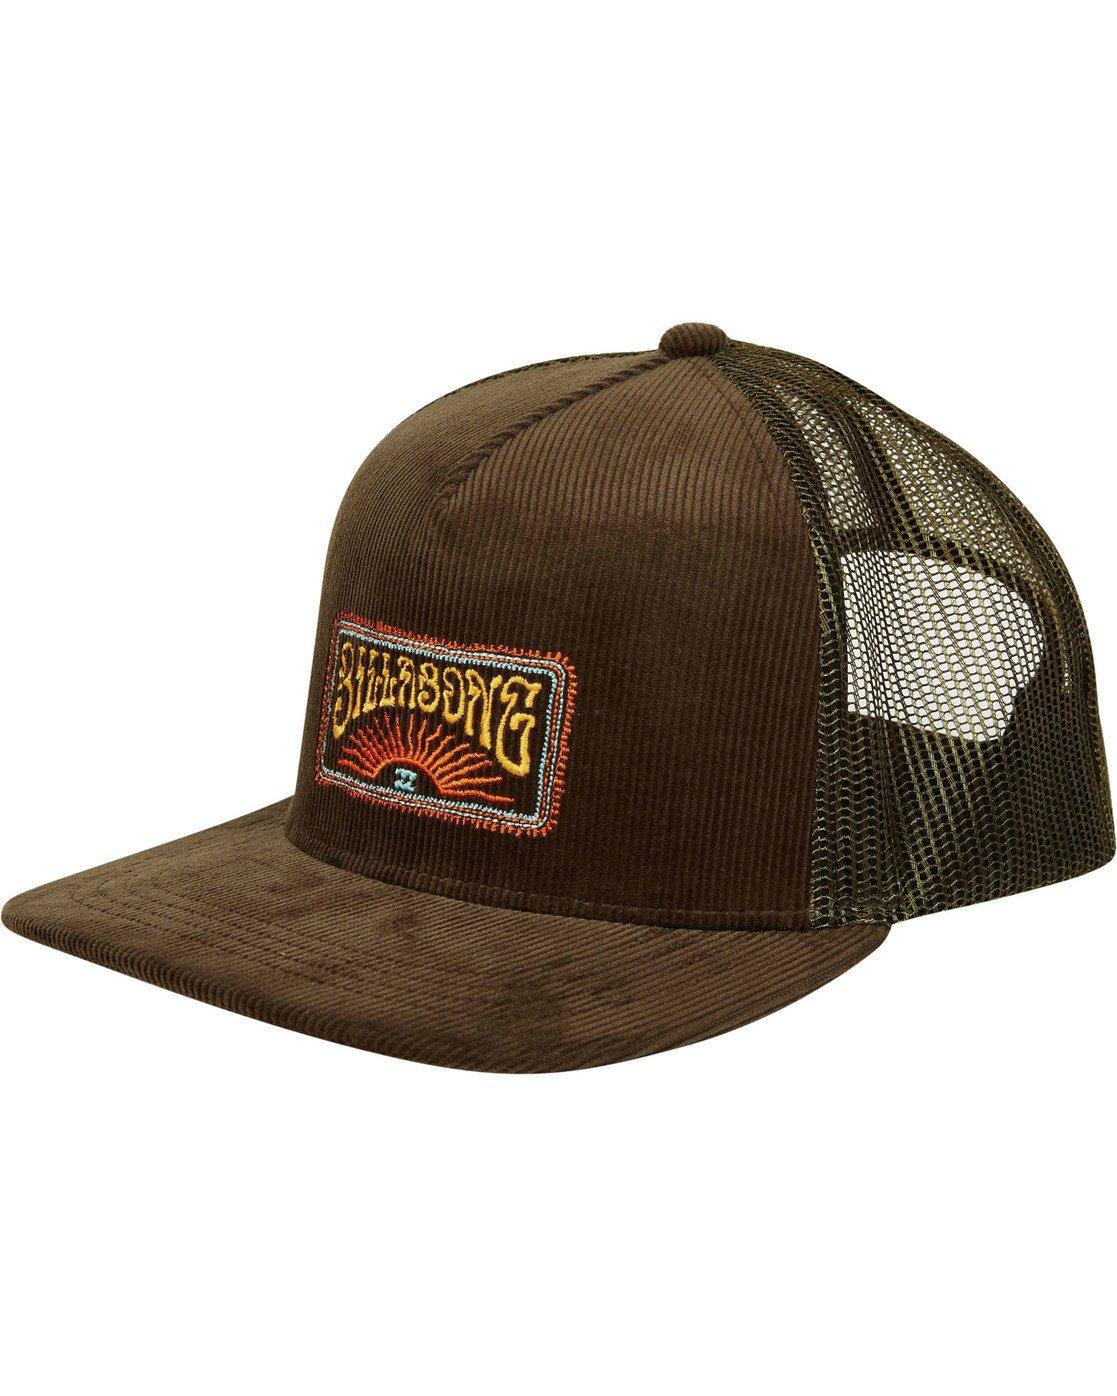 dc42e949 Lyst - Billabong Flatwall Trucker Hat in Brown for Men